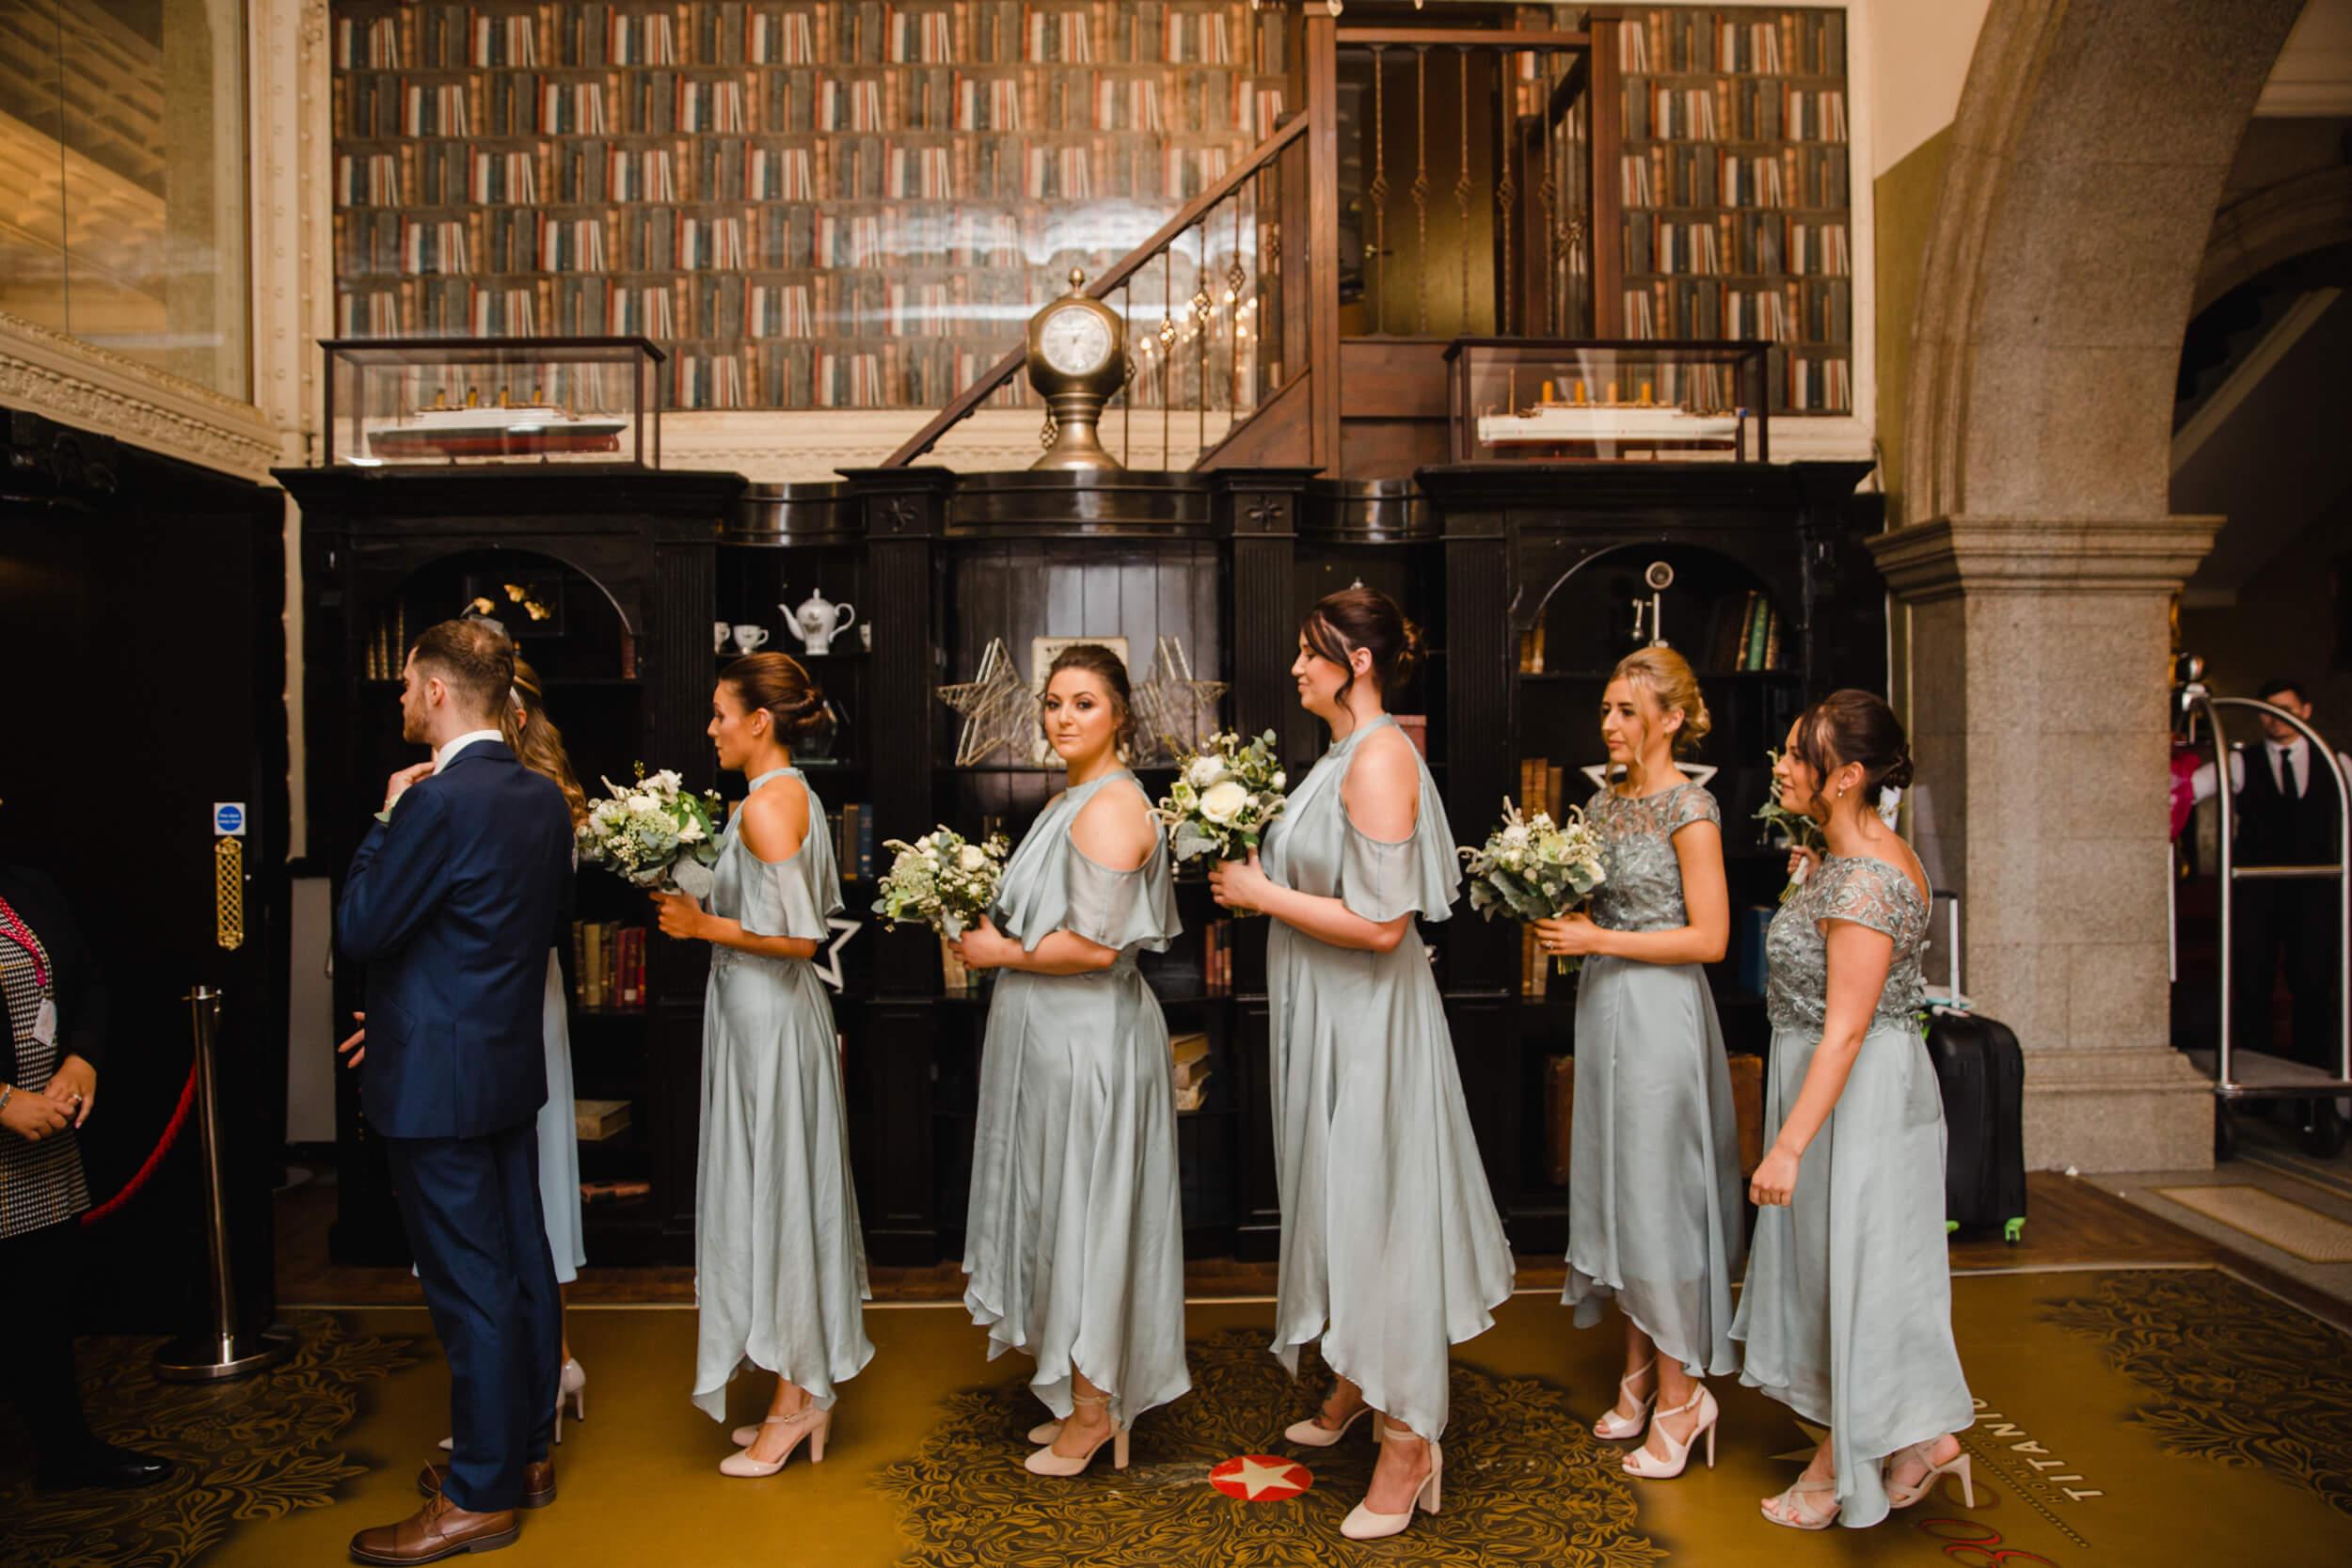 30_James_Street_Hotel_Wedding_Venue_017.jpg